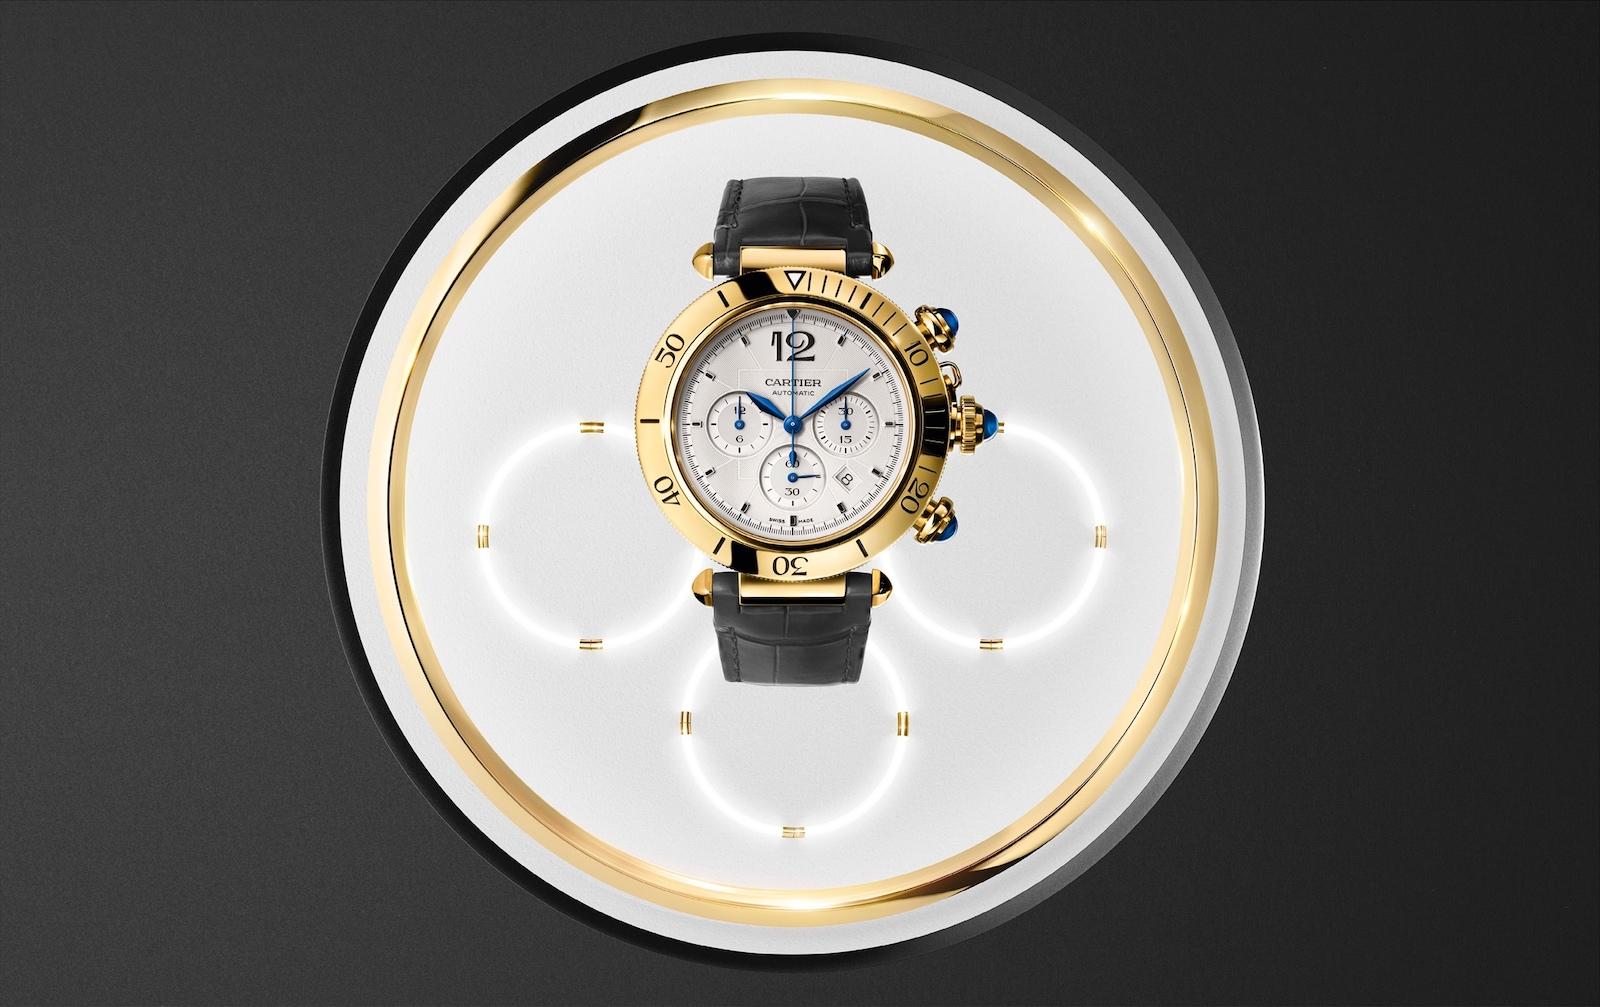 Cartier Pasha Chronograph - gold